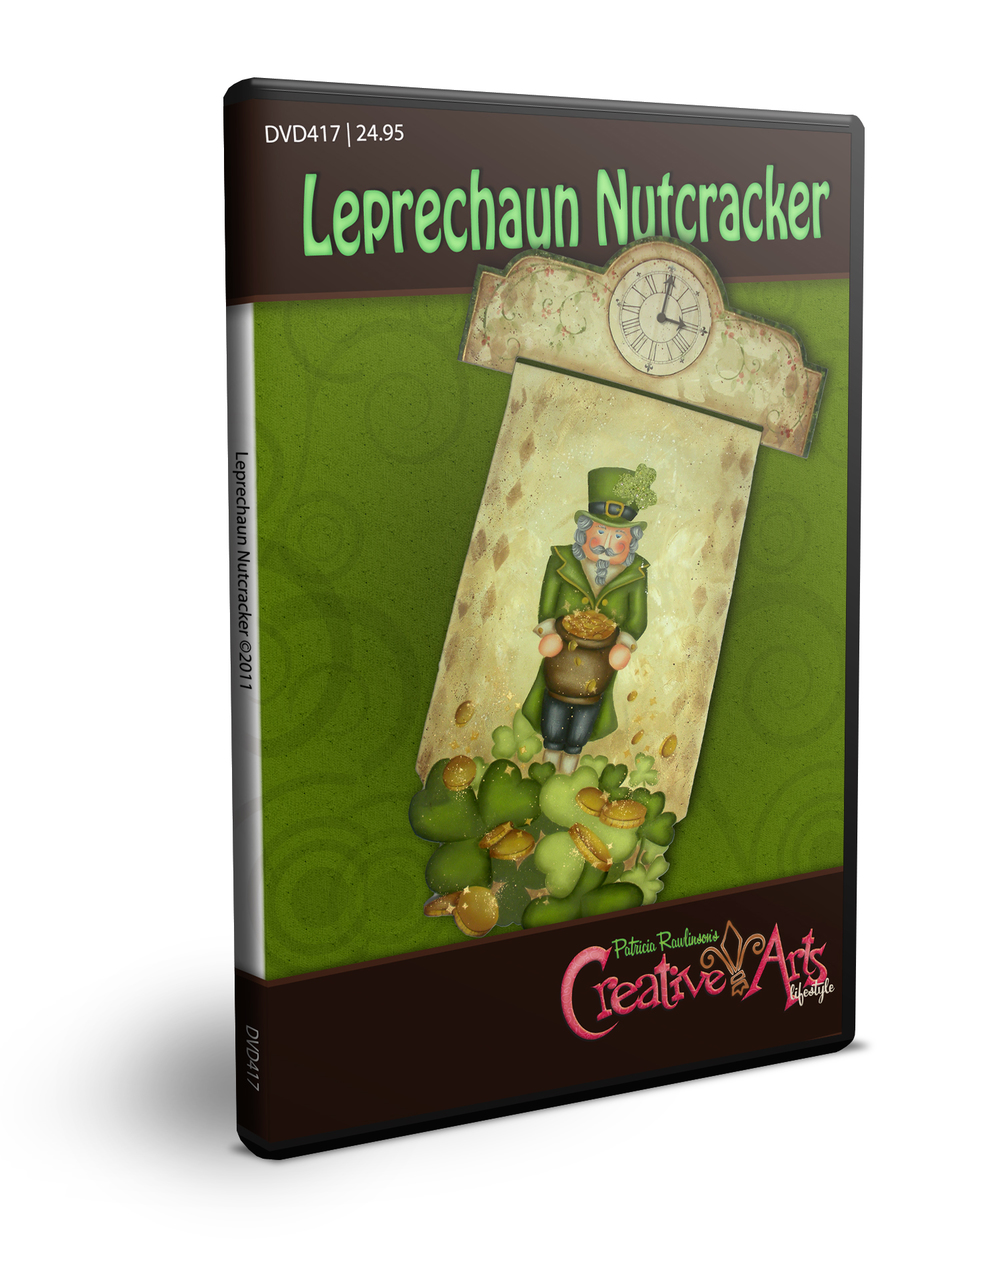 Leprechaun Nutcracker DVD & Pattern Packet - Patricia Rawlinson